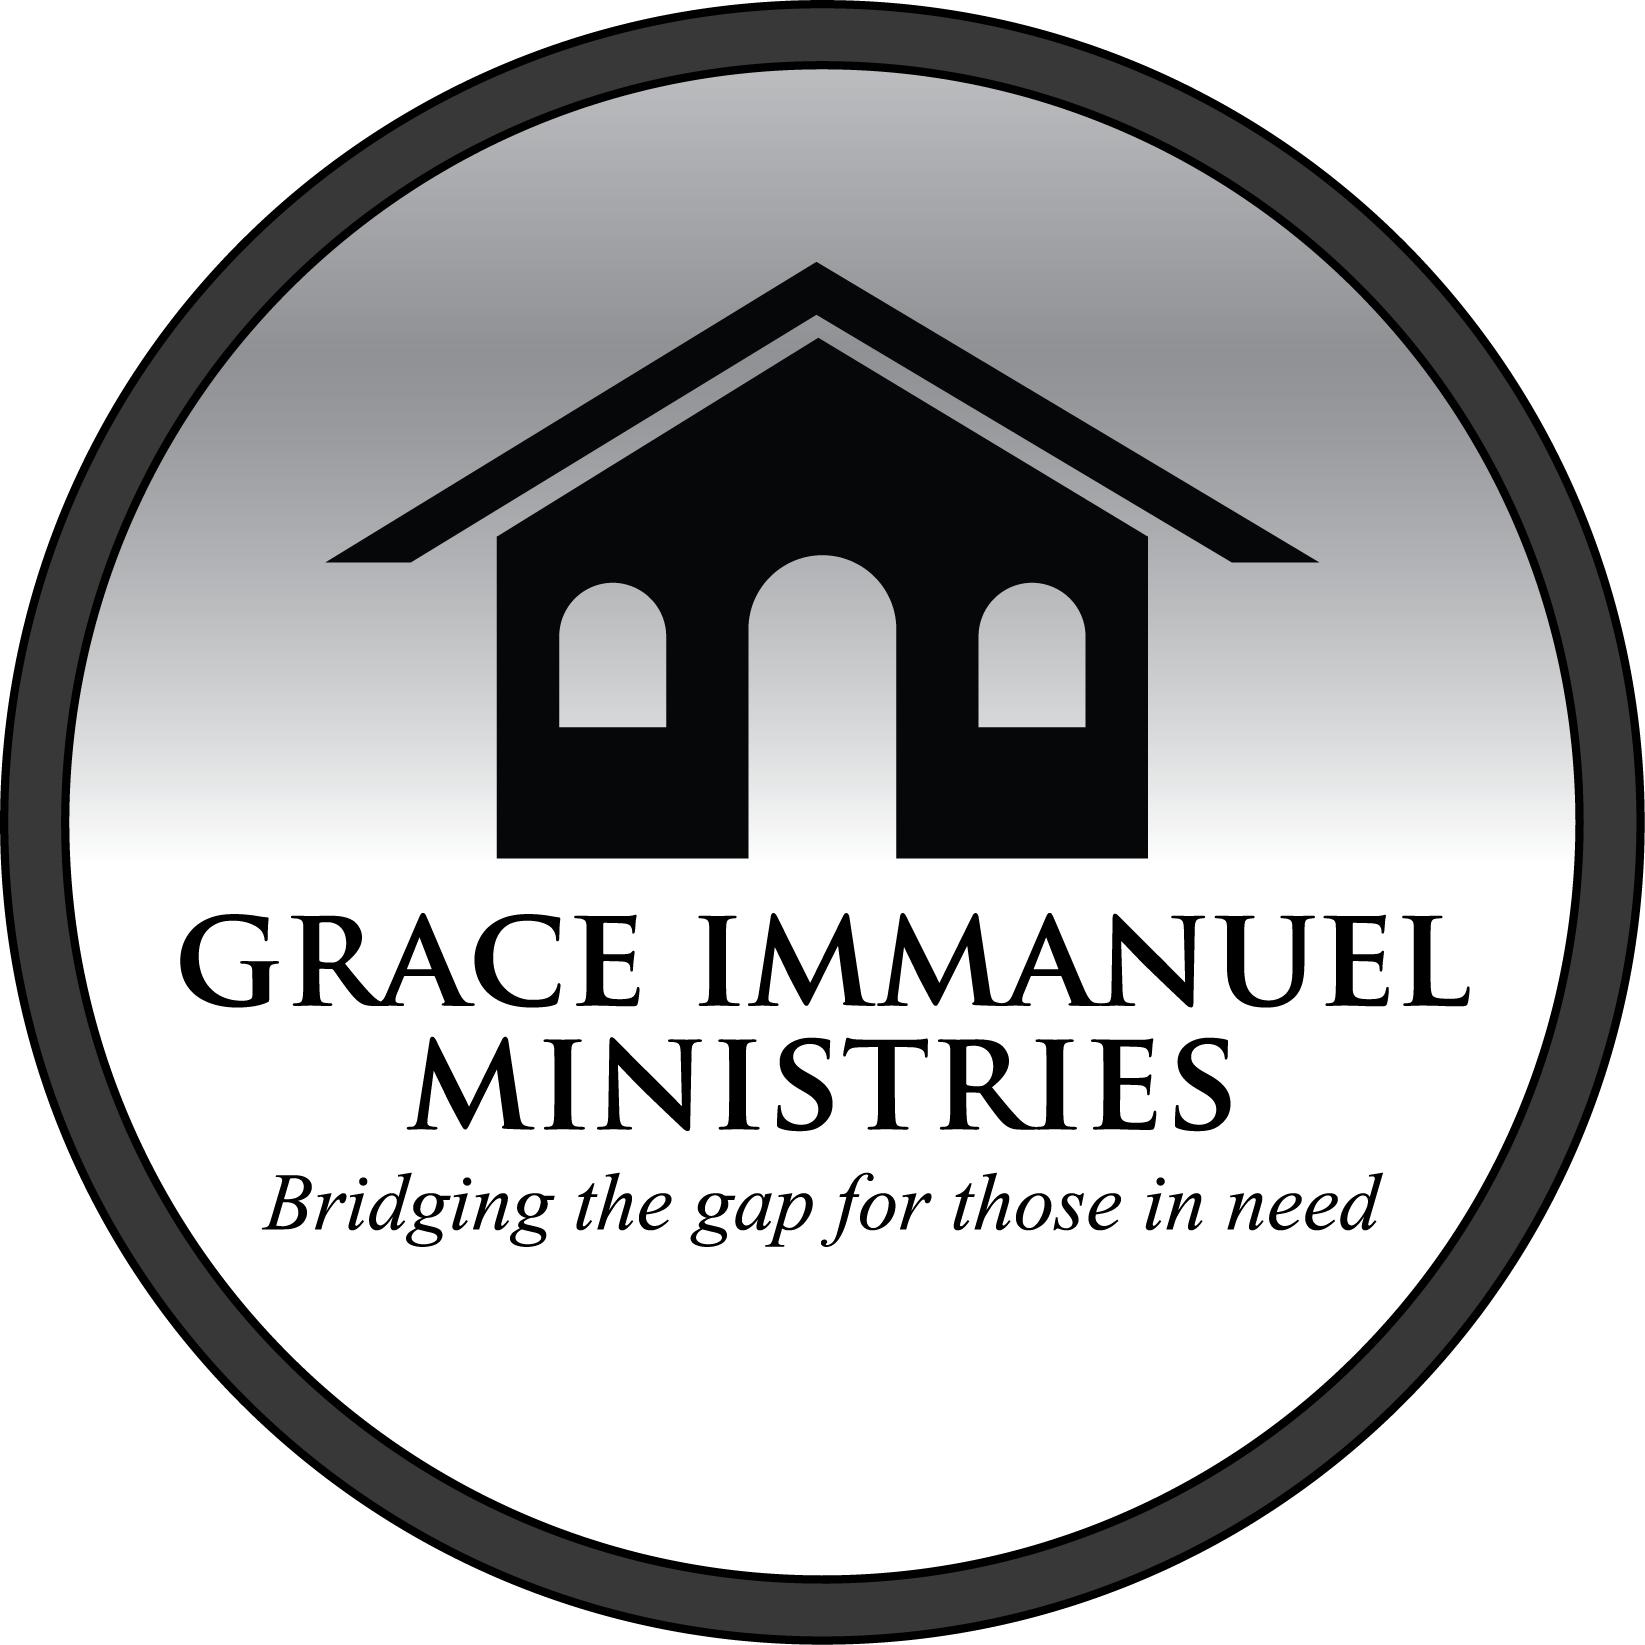 Grace Immanuel Ministries